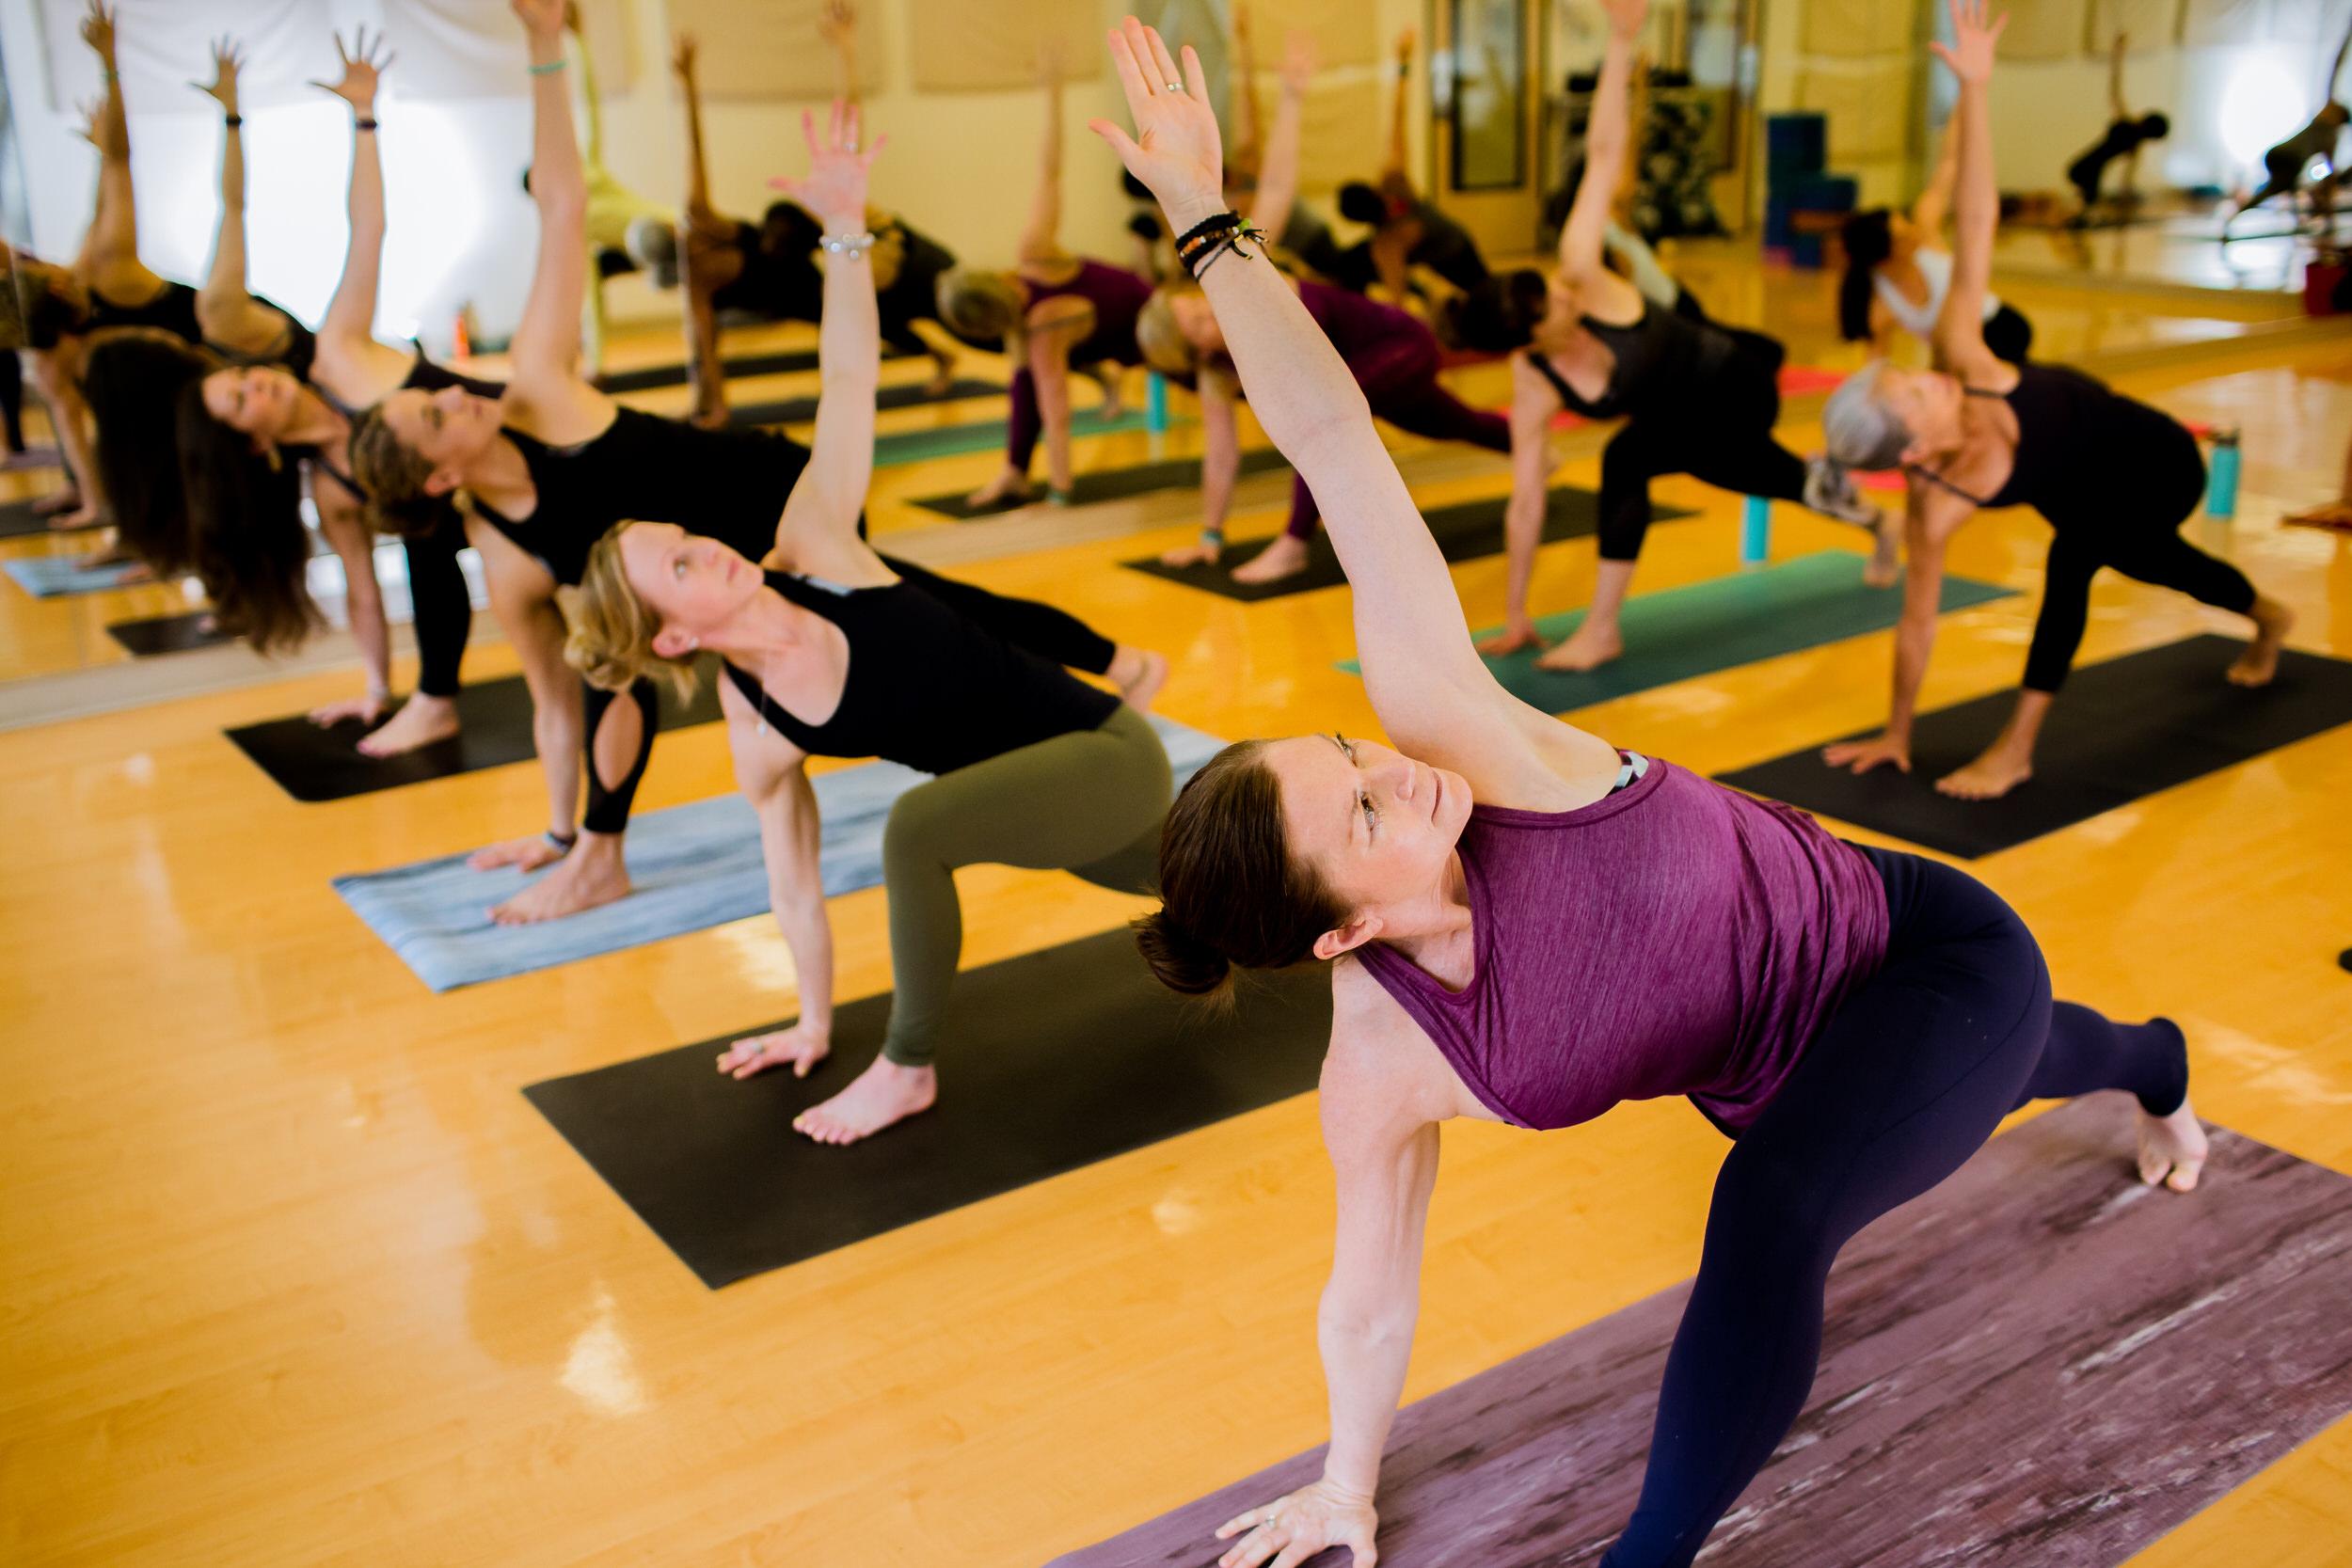 Twist_Yoga_Website_Rebranding_Markerting_Photos018